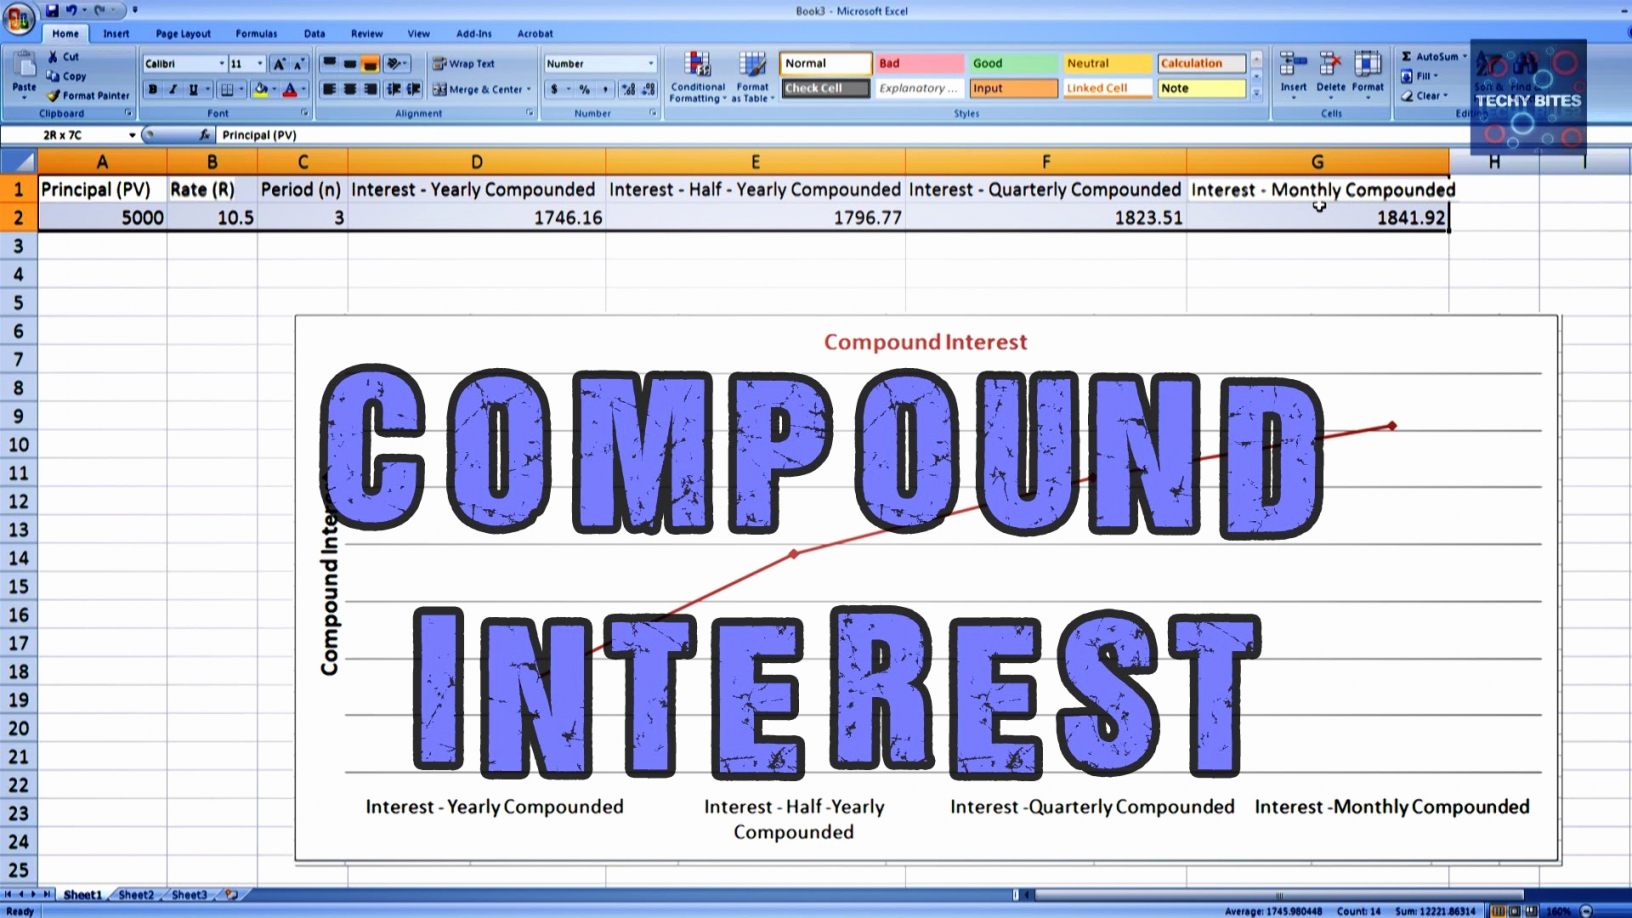 Compound Interest Spreadsheet Bitconnect In Sheet Compound Interest Spreadsheet Formula Excel Worksheet Download